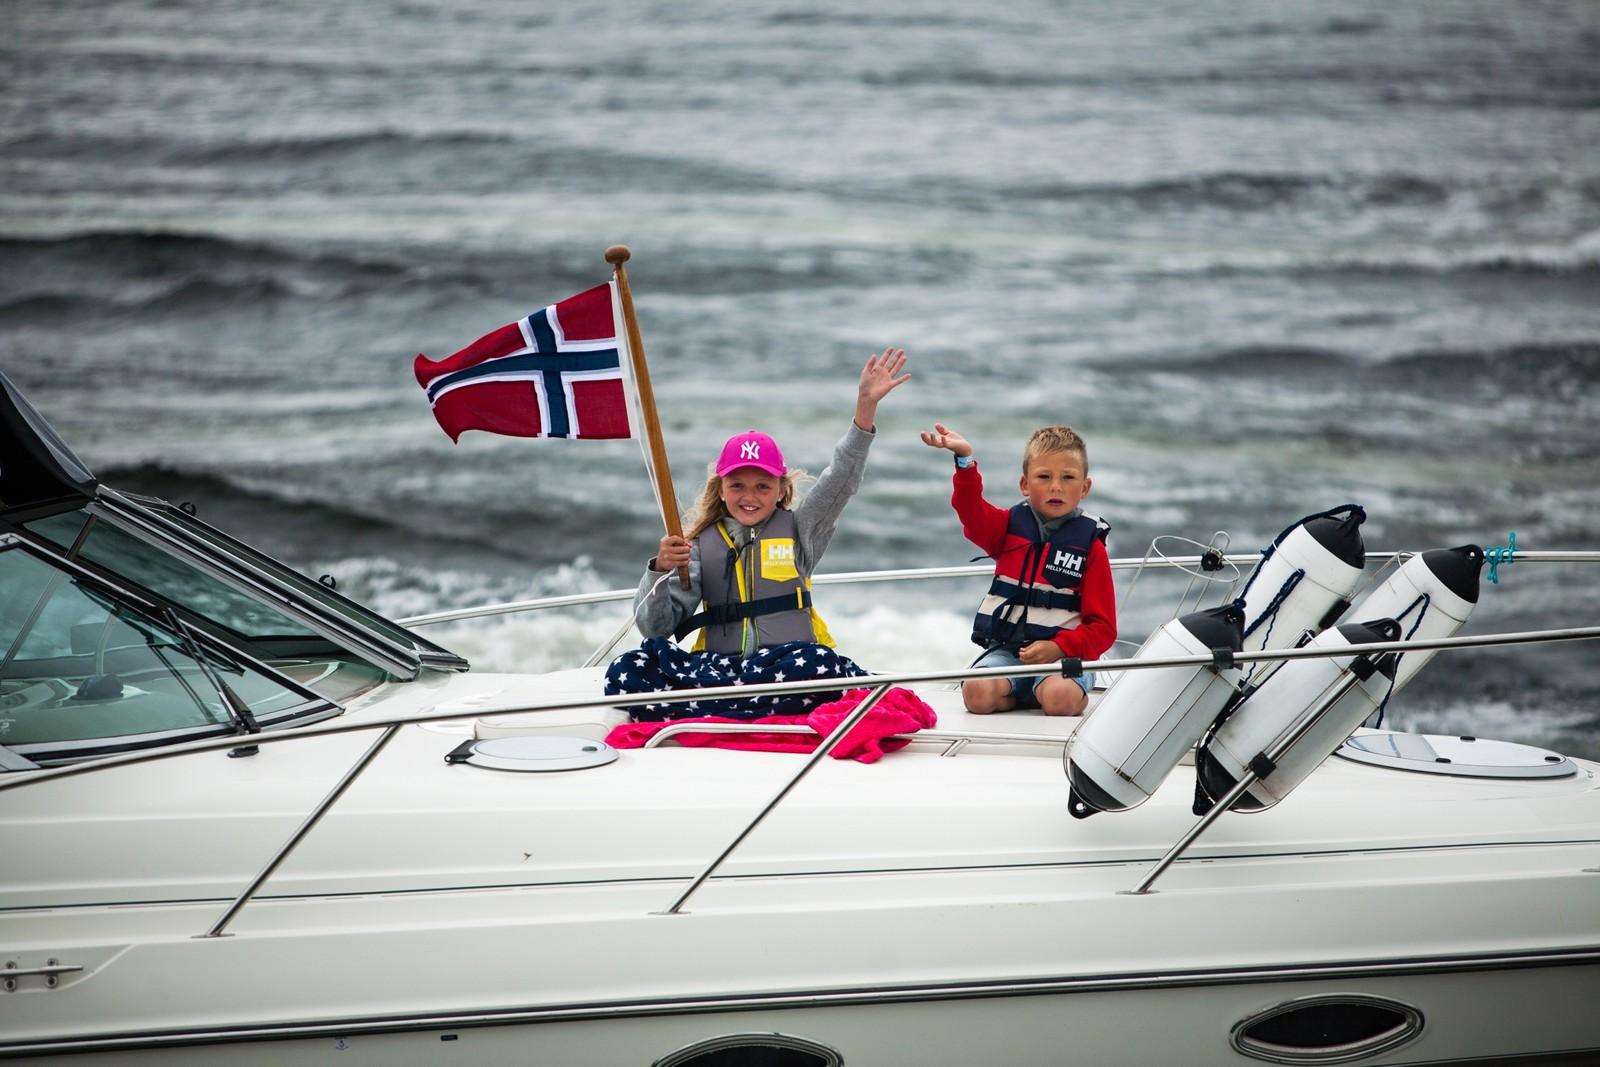 God stemning på småbåtene som følger Skibladner på Mjøsa.